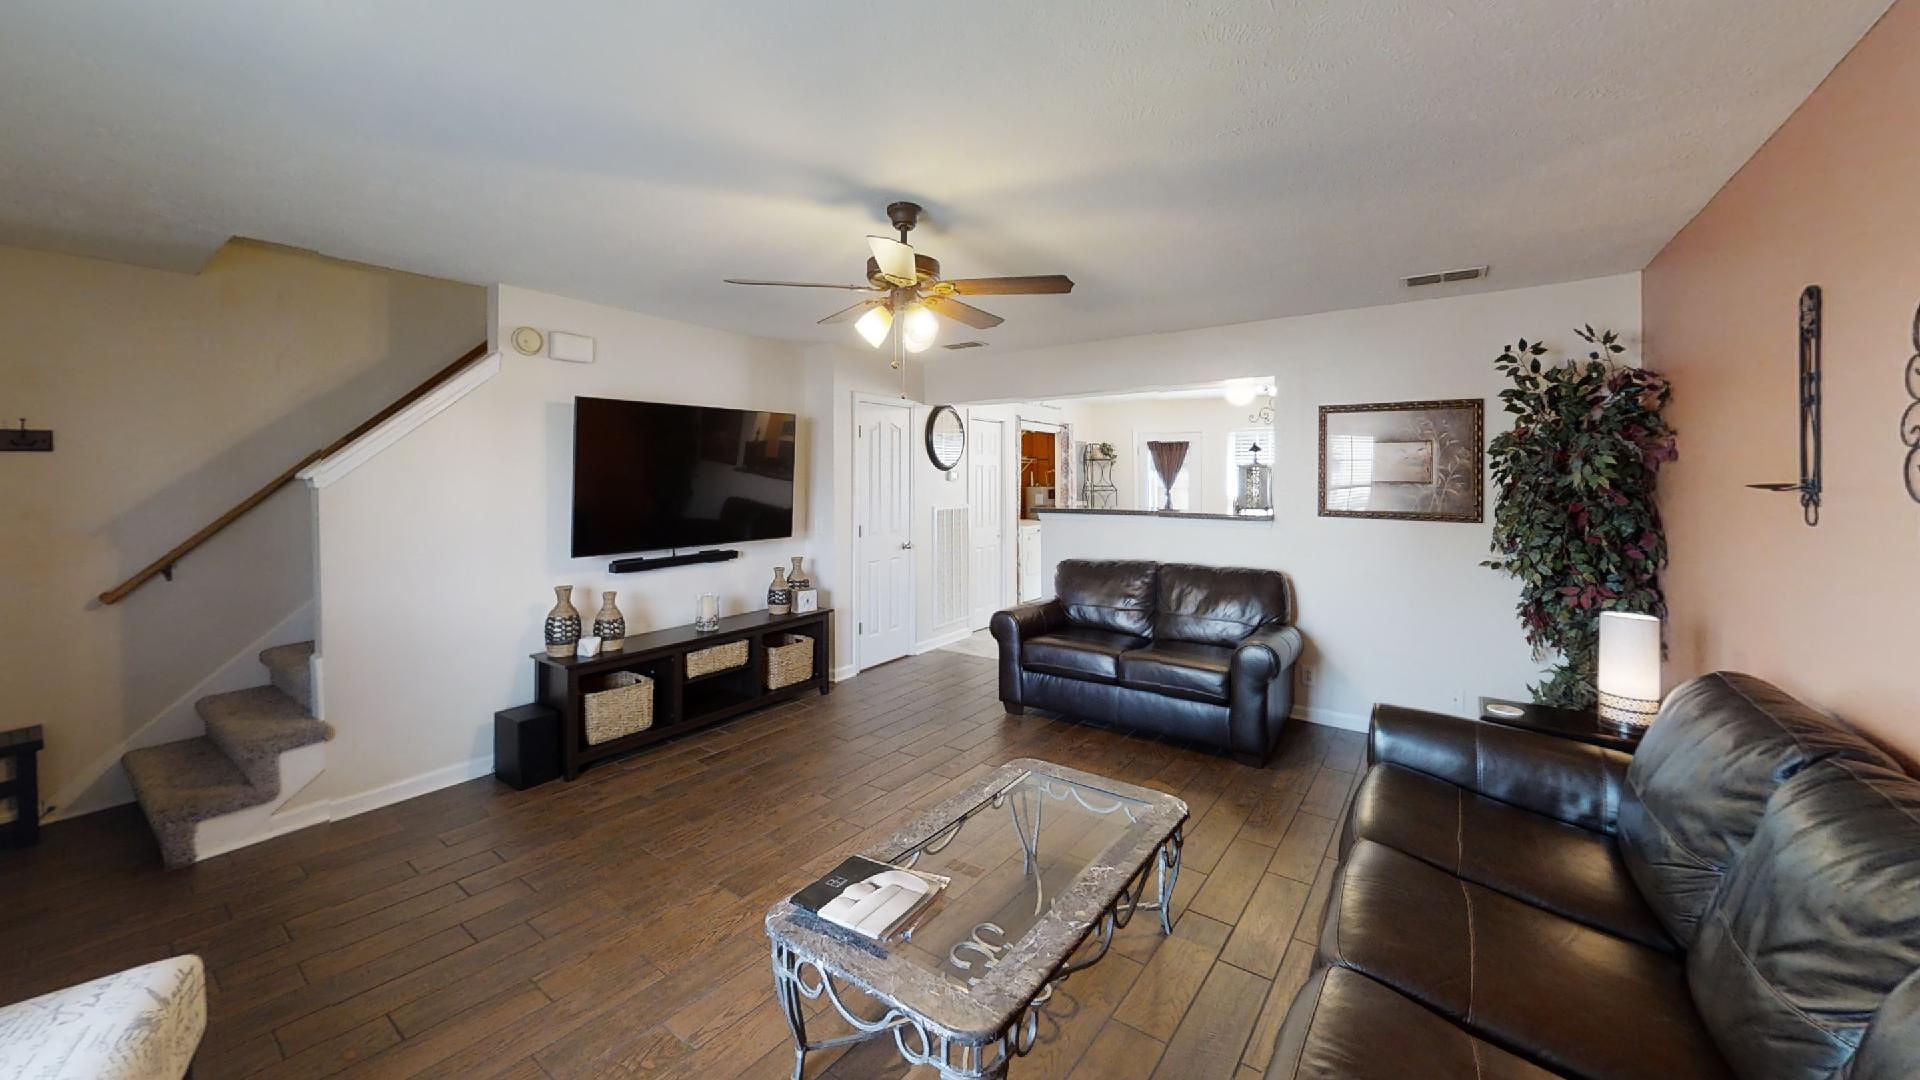 327 Shoshone Pl Property Picture 5